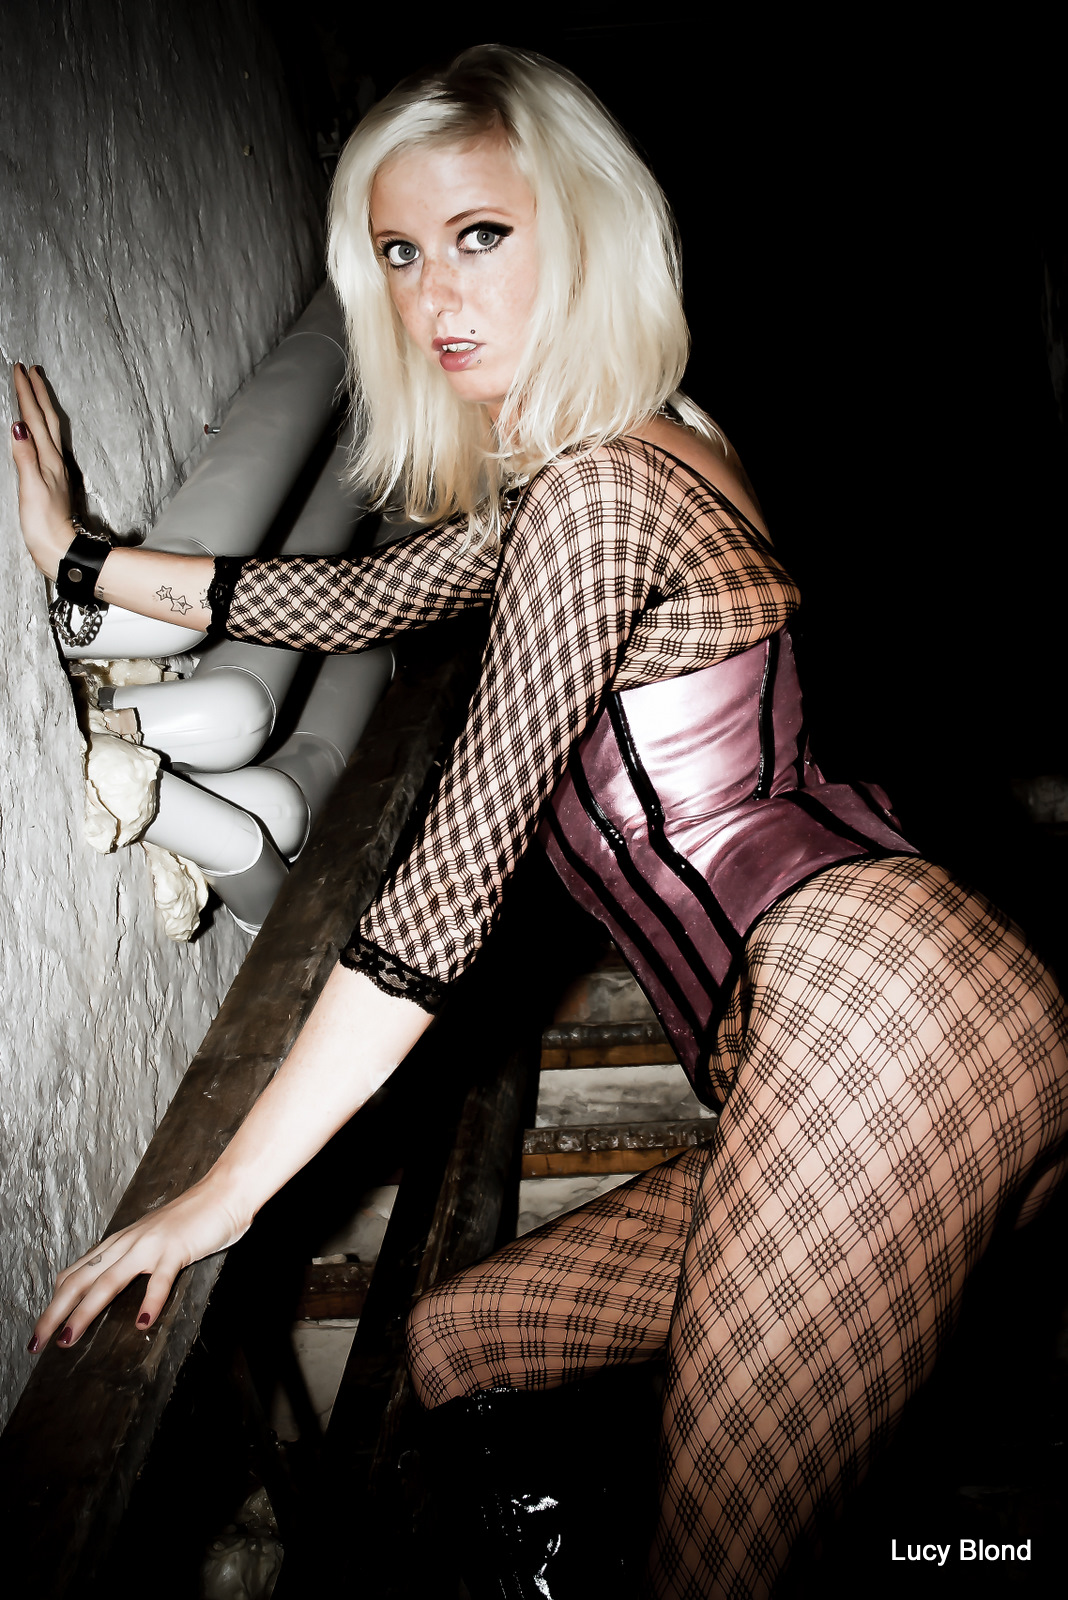 Lucy Blond 6